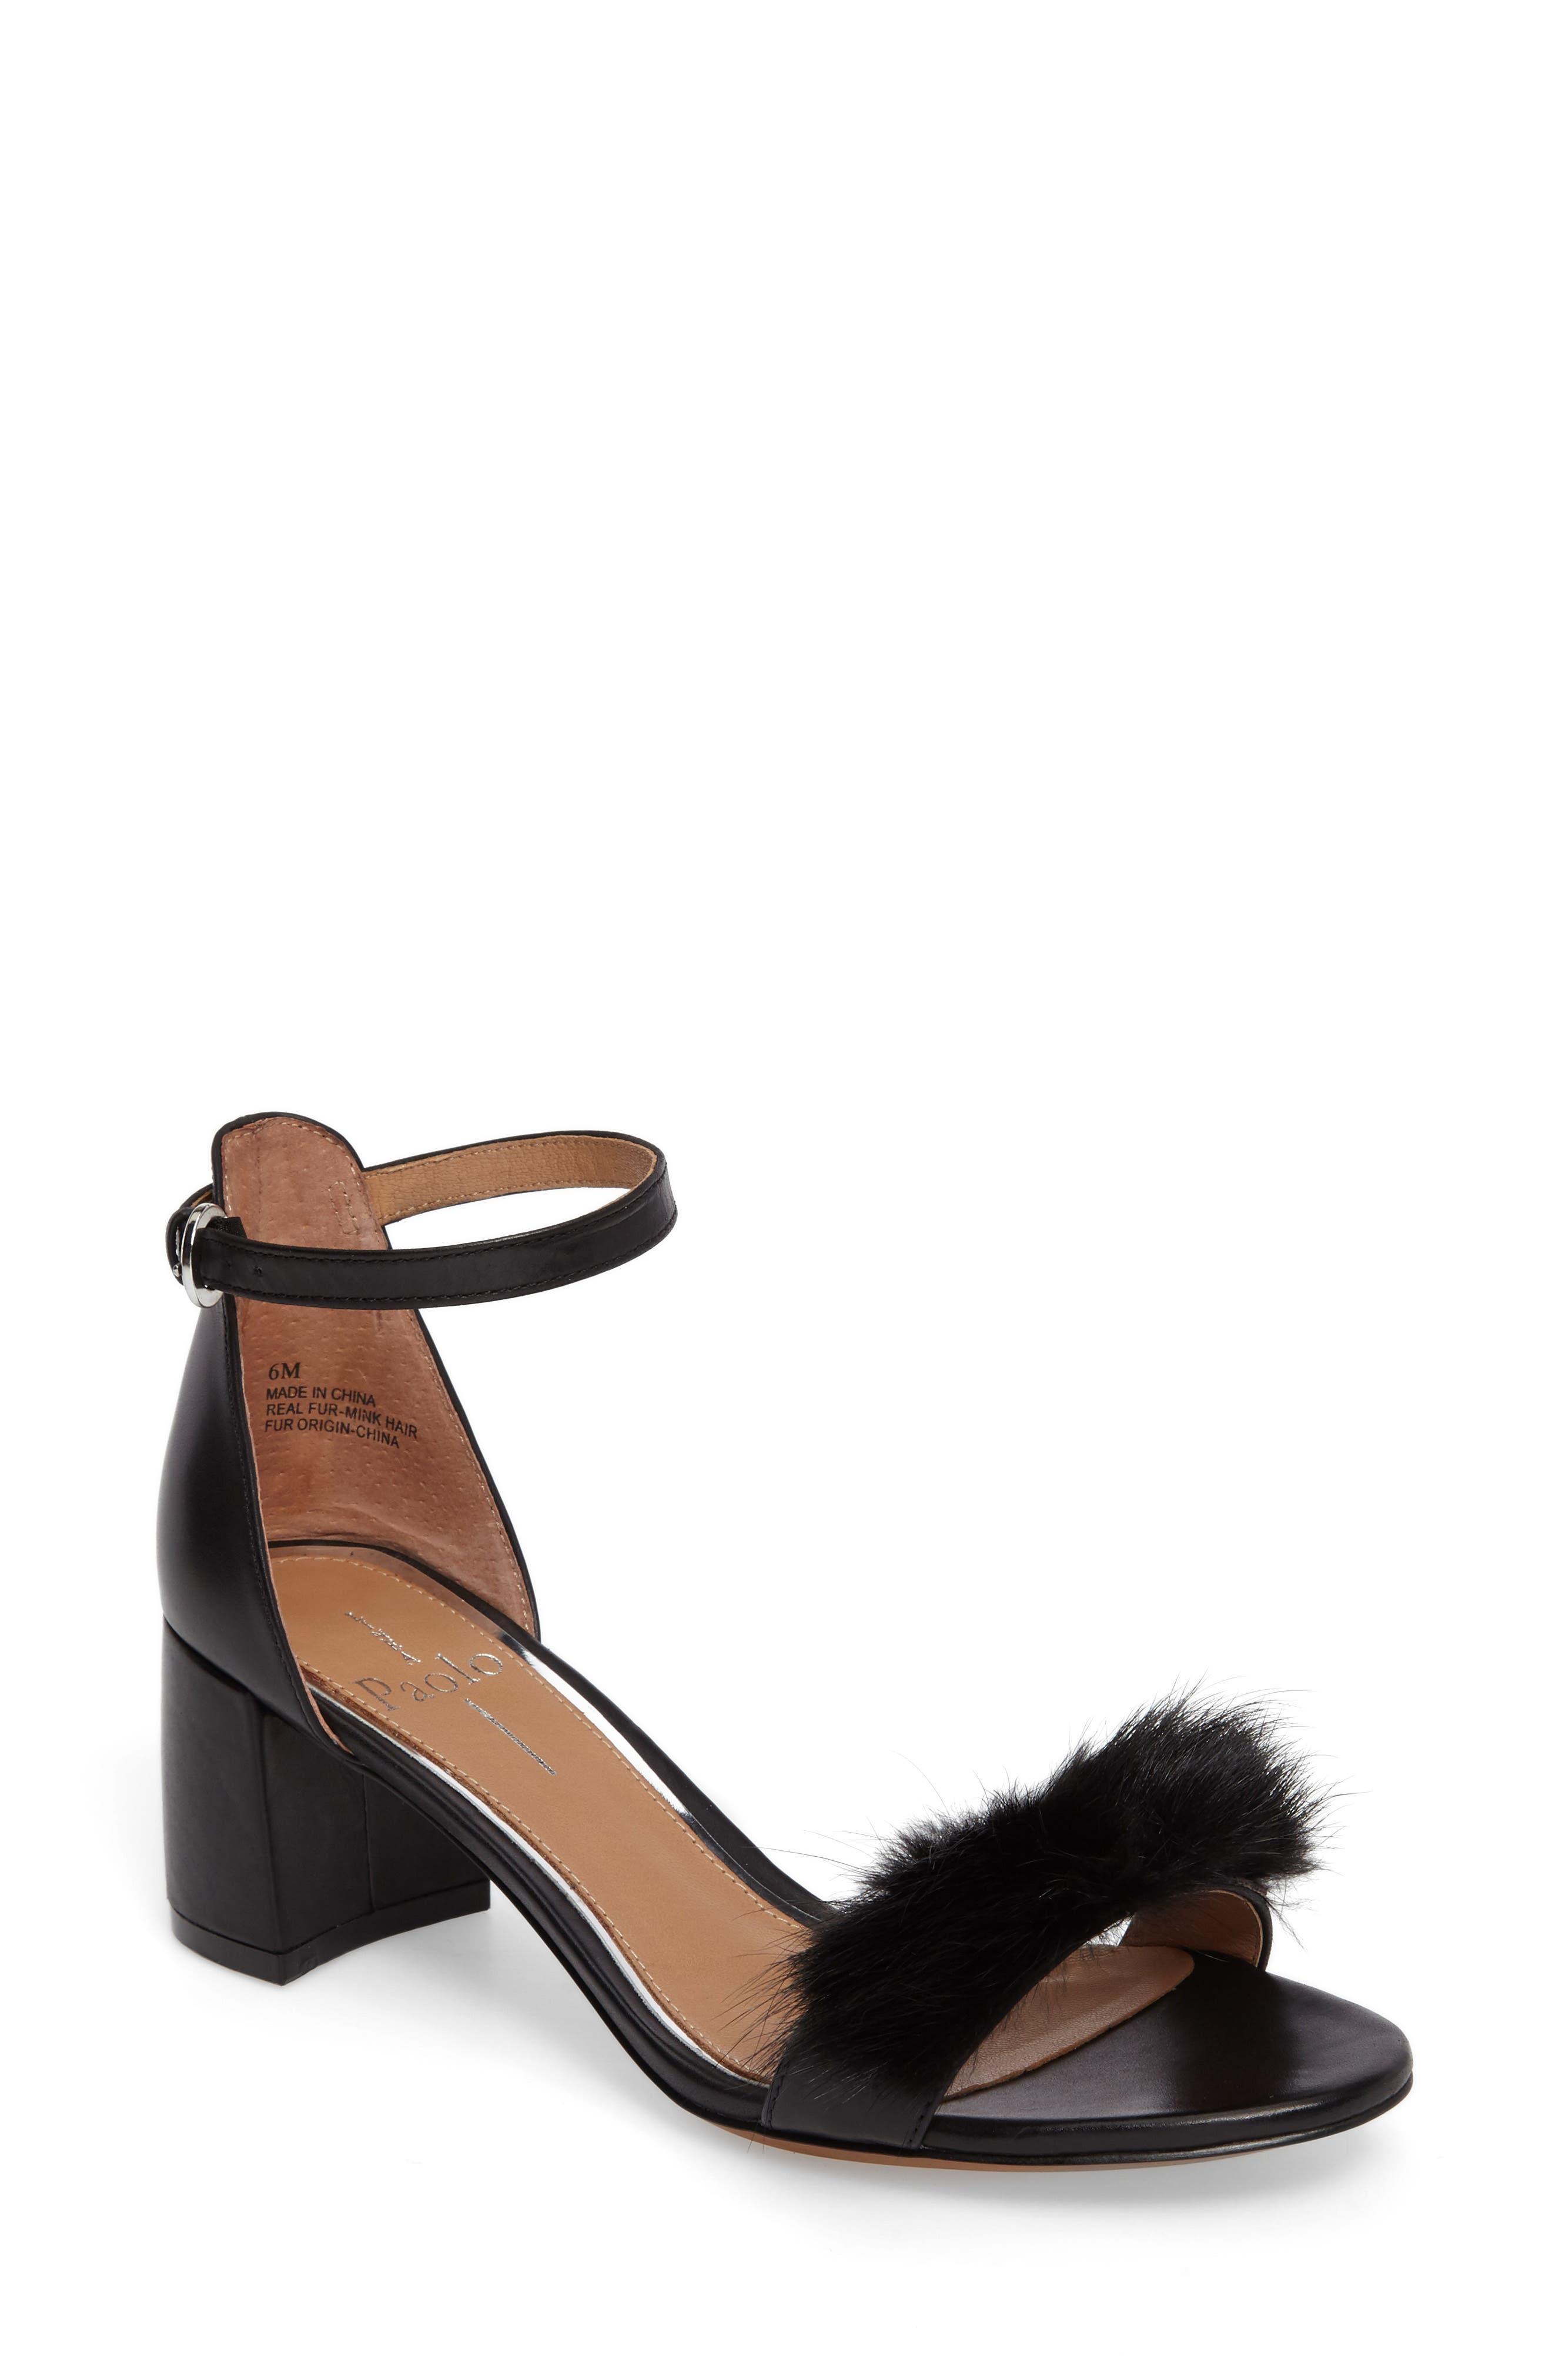 Hepburn Genuine Mink Fur Sandal,                             Main thumbnail 1, color,                             008